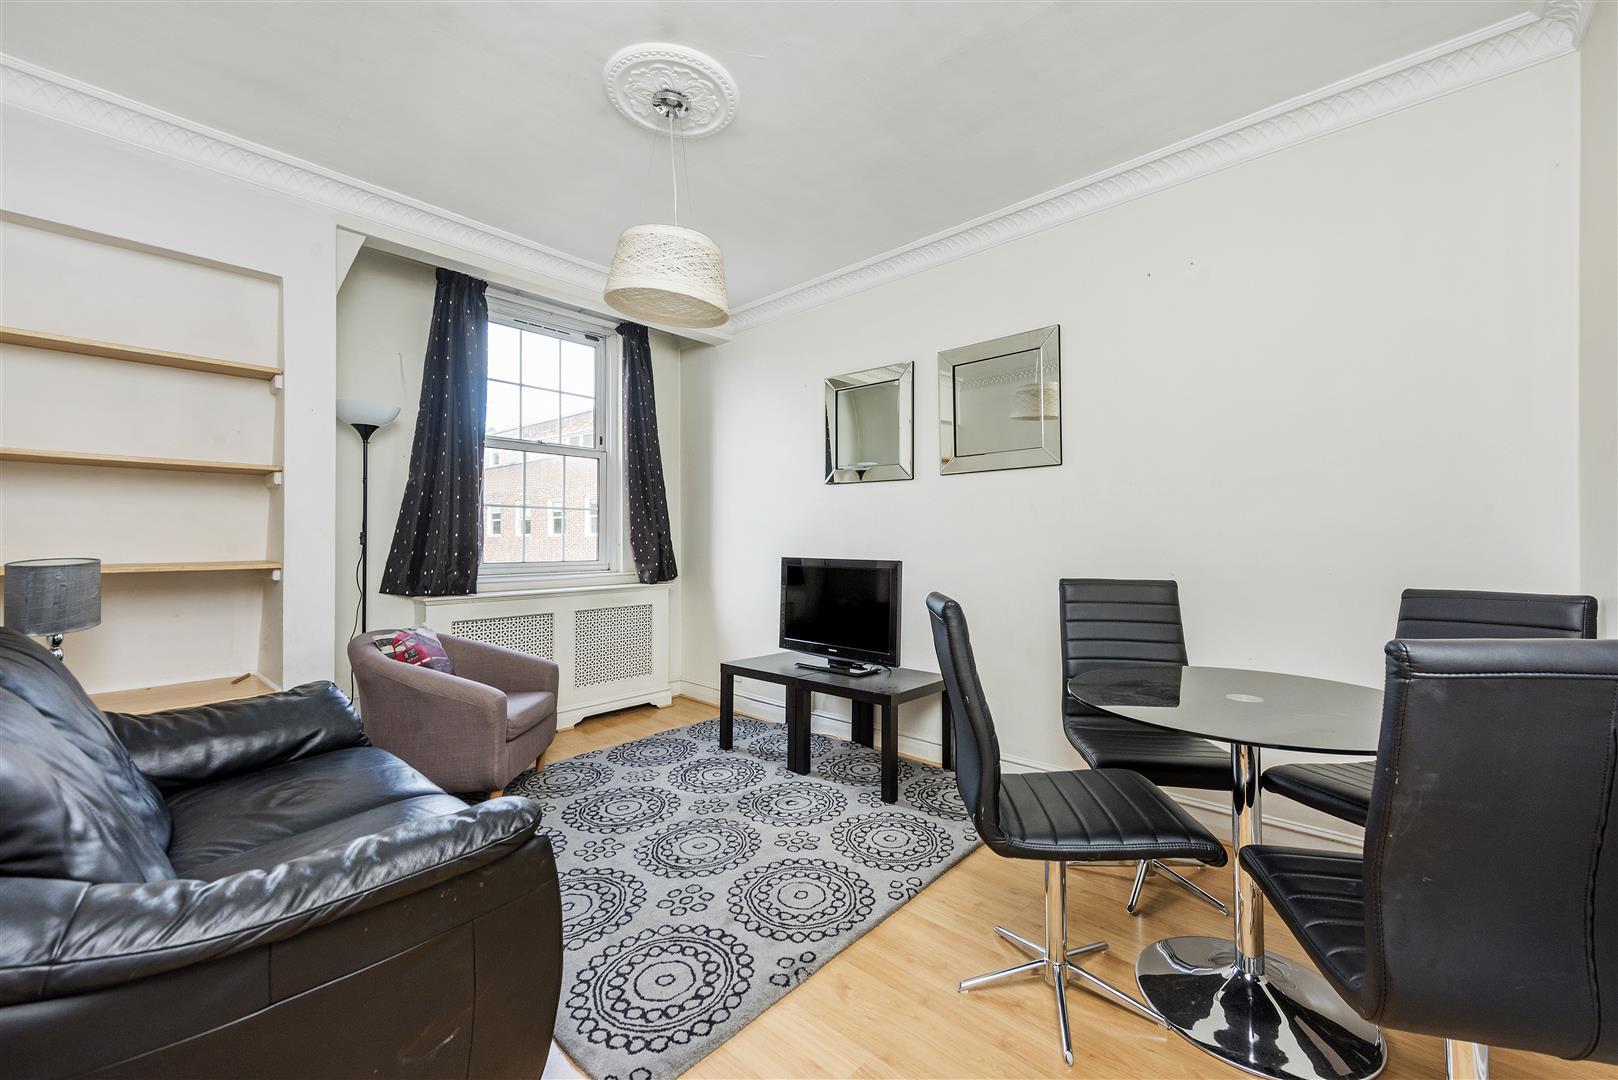 2 Bedrooms Flat for sale in Norfolk House, Regency Street, Westminster, London, SW1P